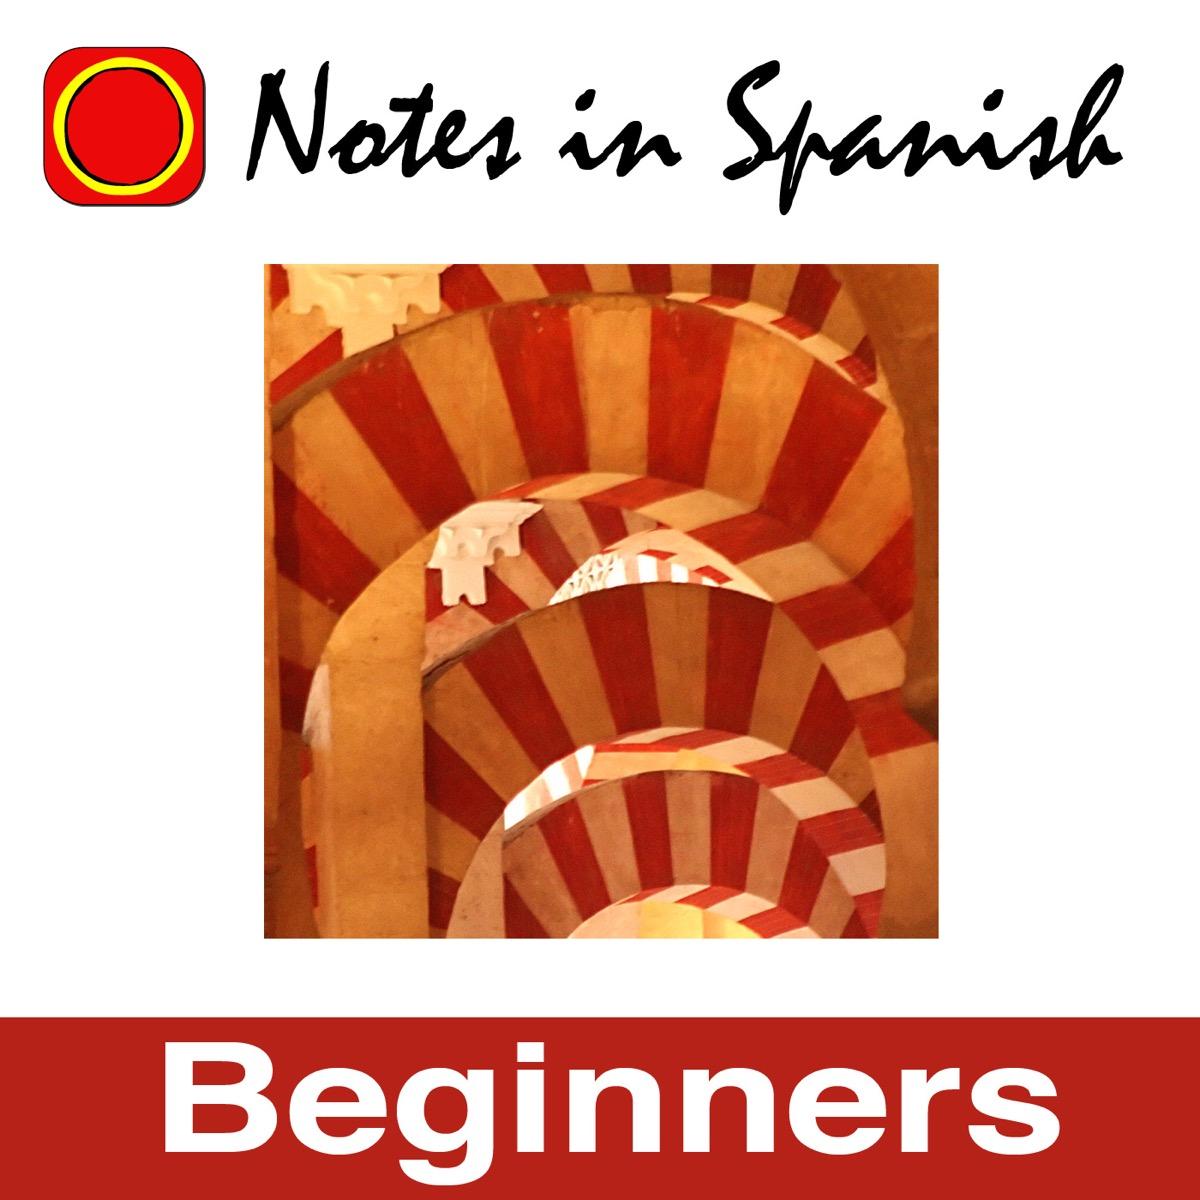 Workbooks notes in spanish intermediate worksheets free : Learn Spanish: Notes in Spanish Inspired Beginners | Lyssna här ...